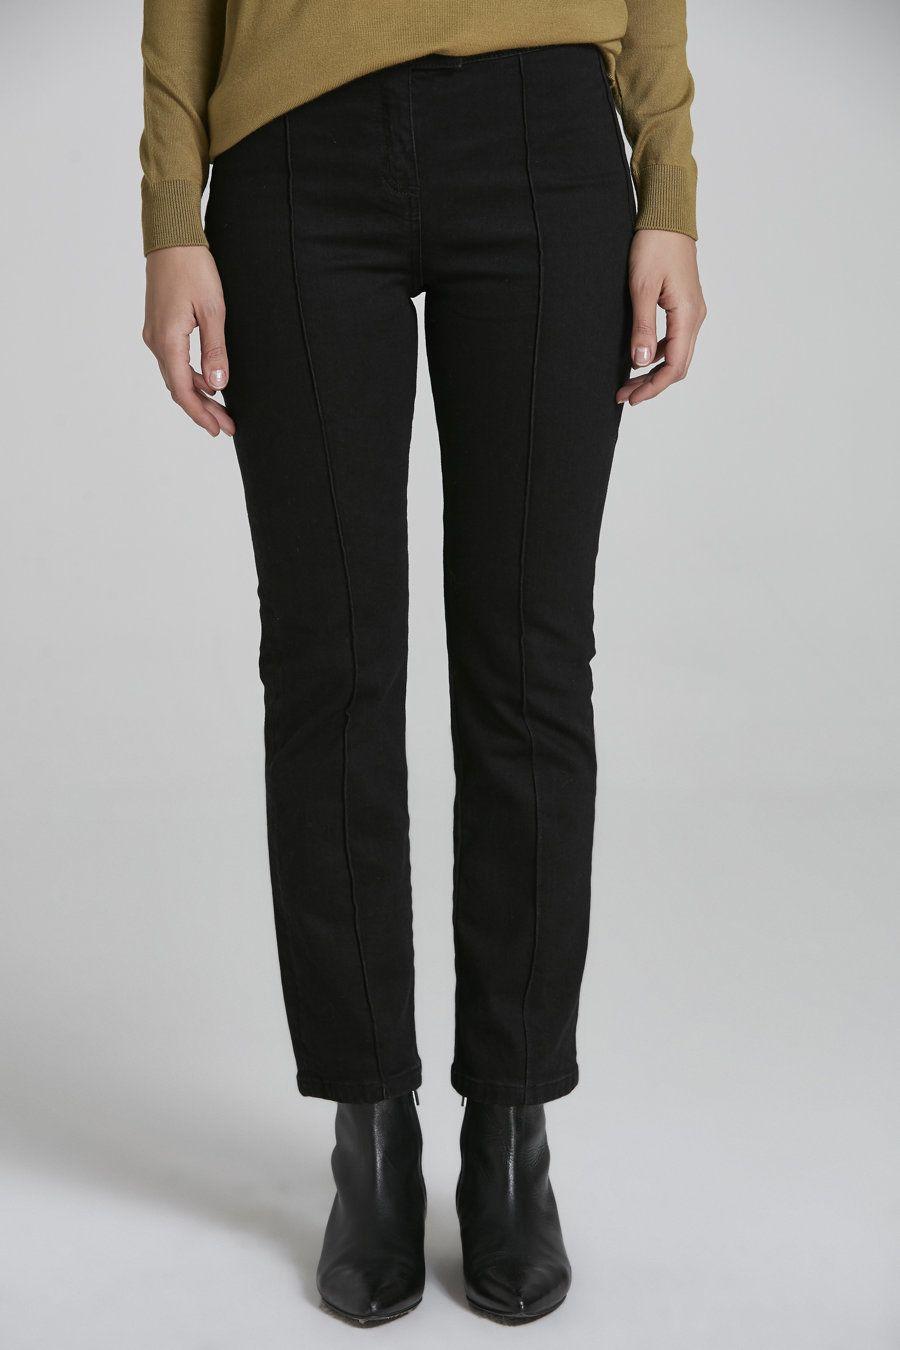 Bol Jean Pantolon Super Fiyatlar Adl Pantolon Siyah Kot Jean